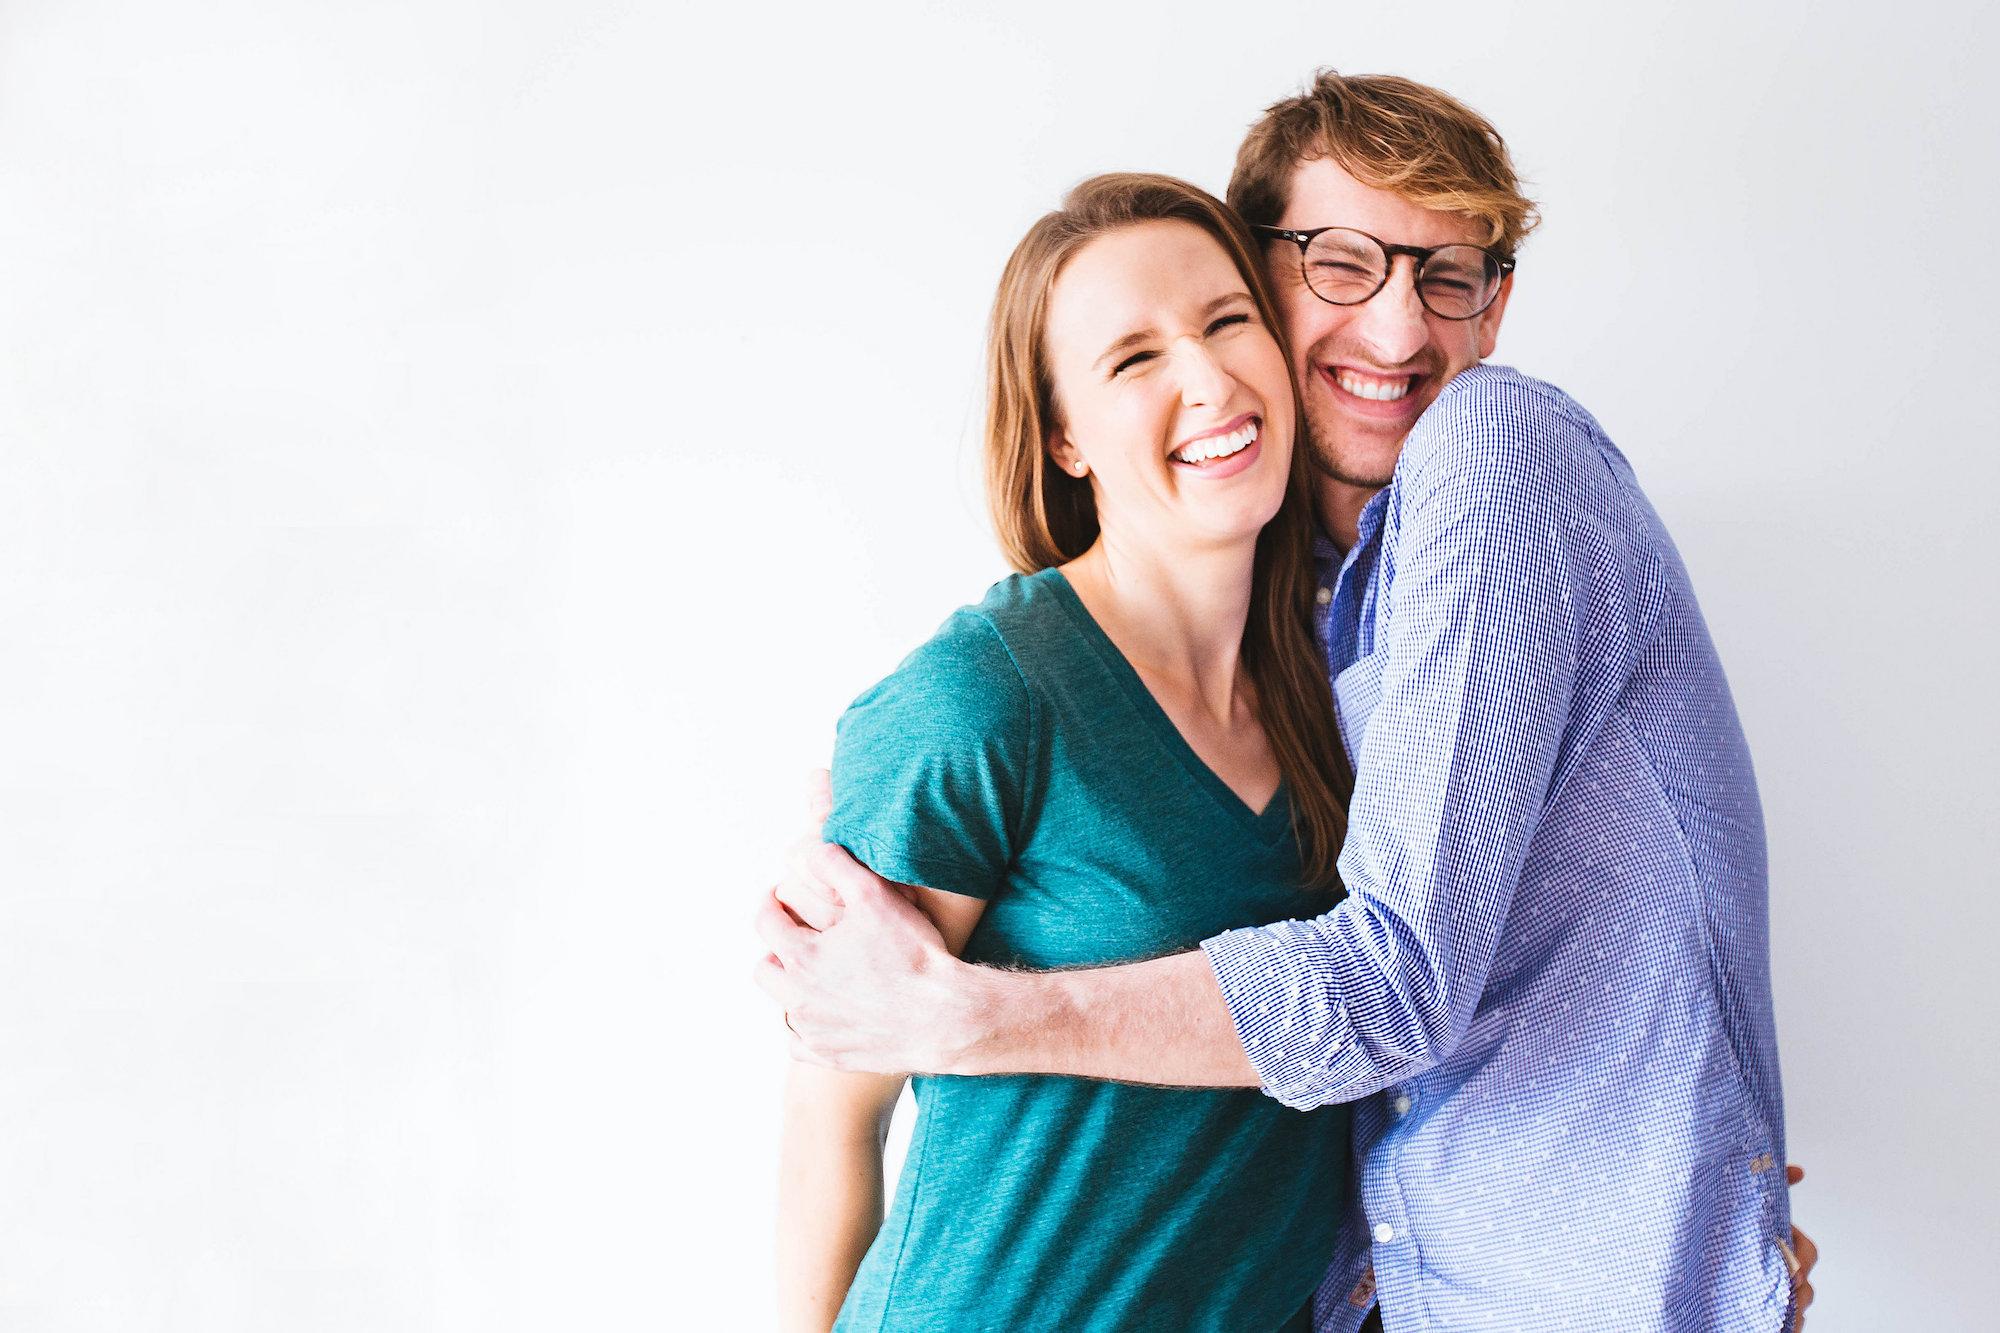 Photo of John and Dana hugging